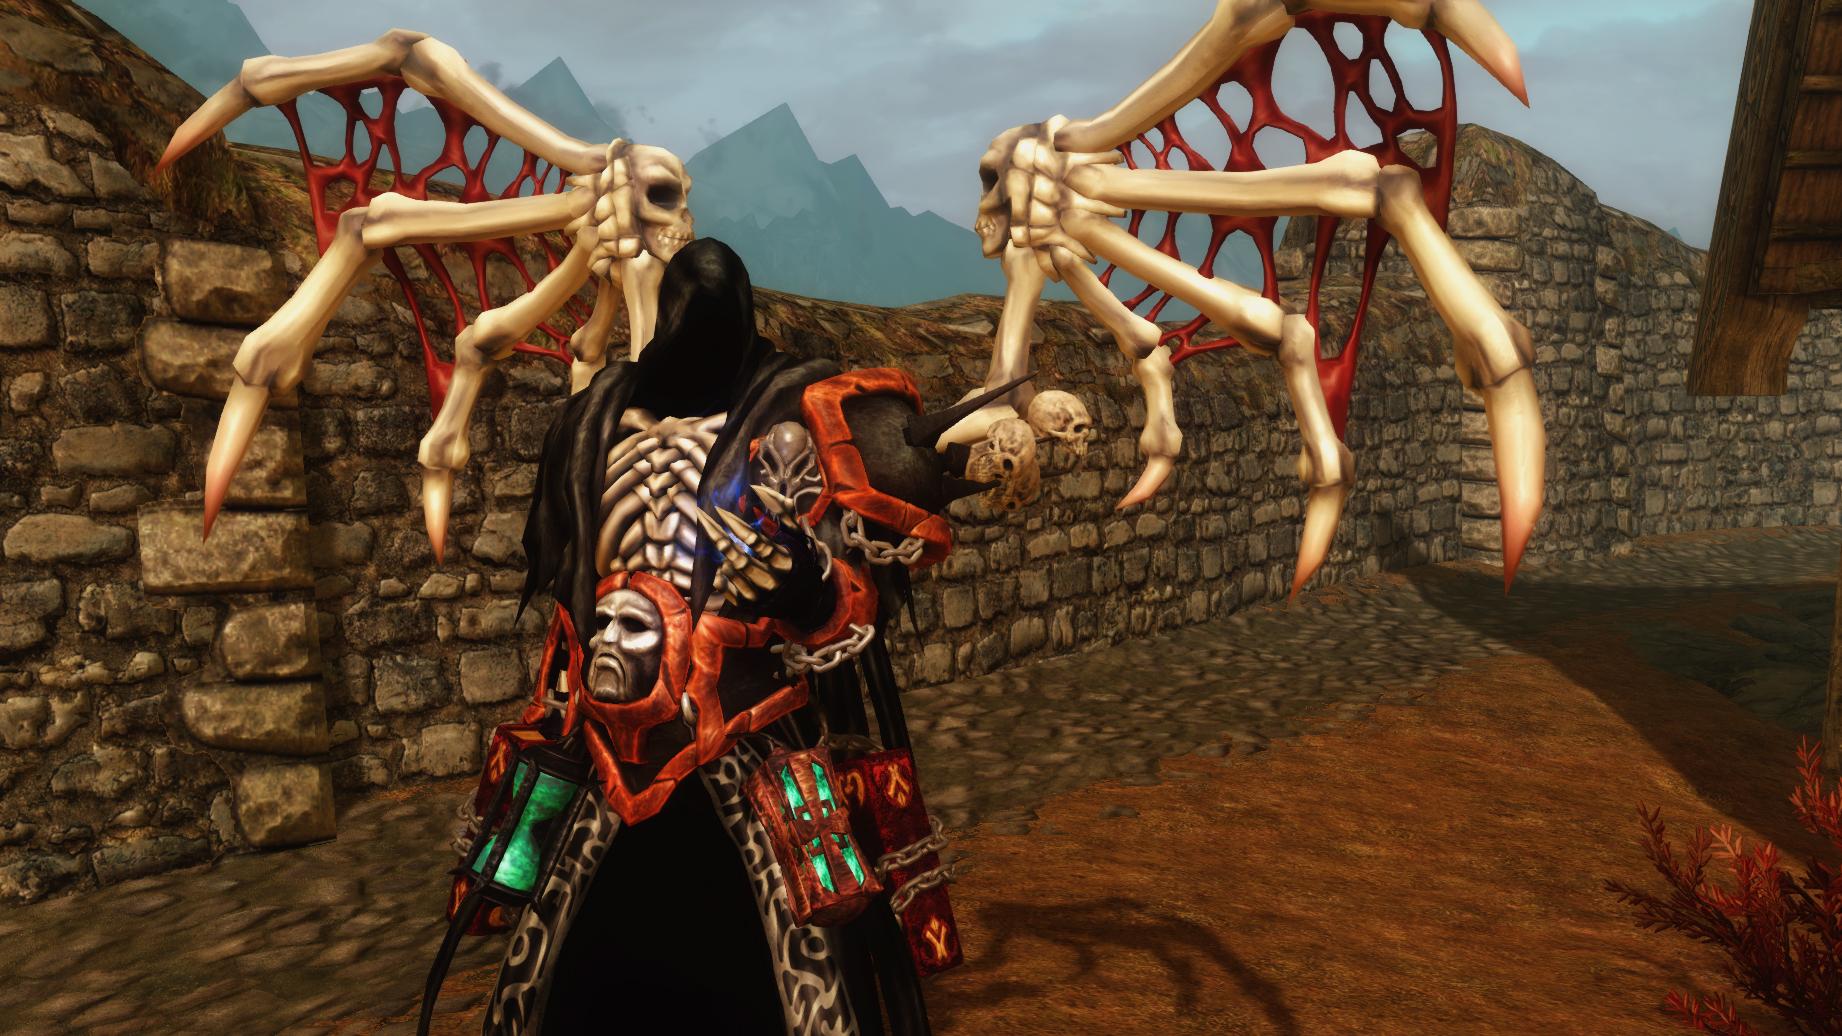 Death reaper form 01 by Ryushenron on DeviantArt